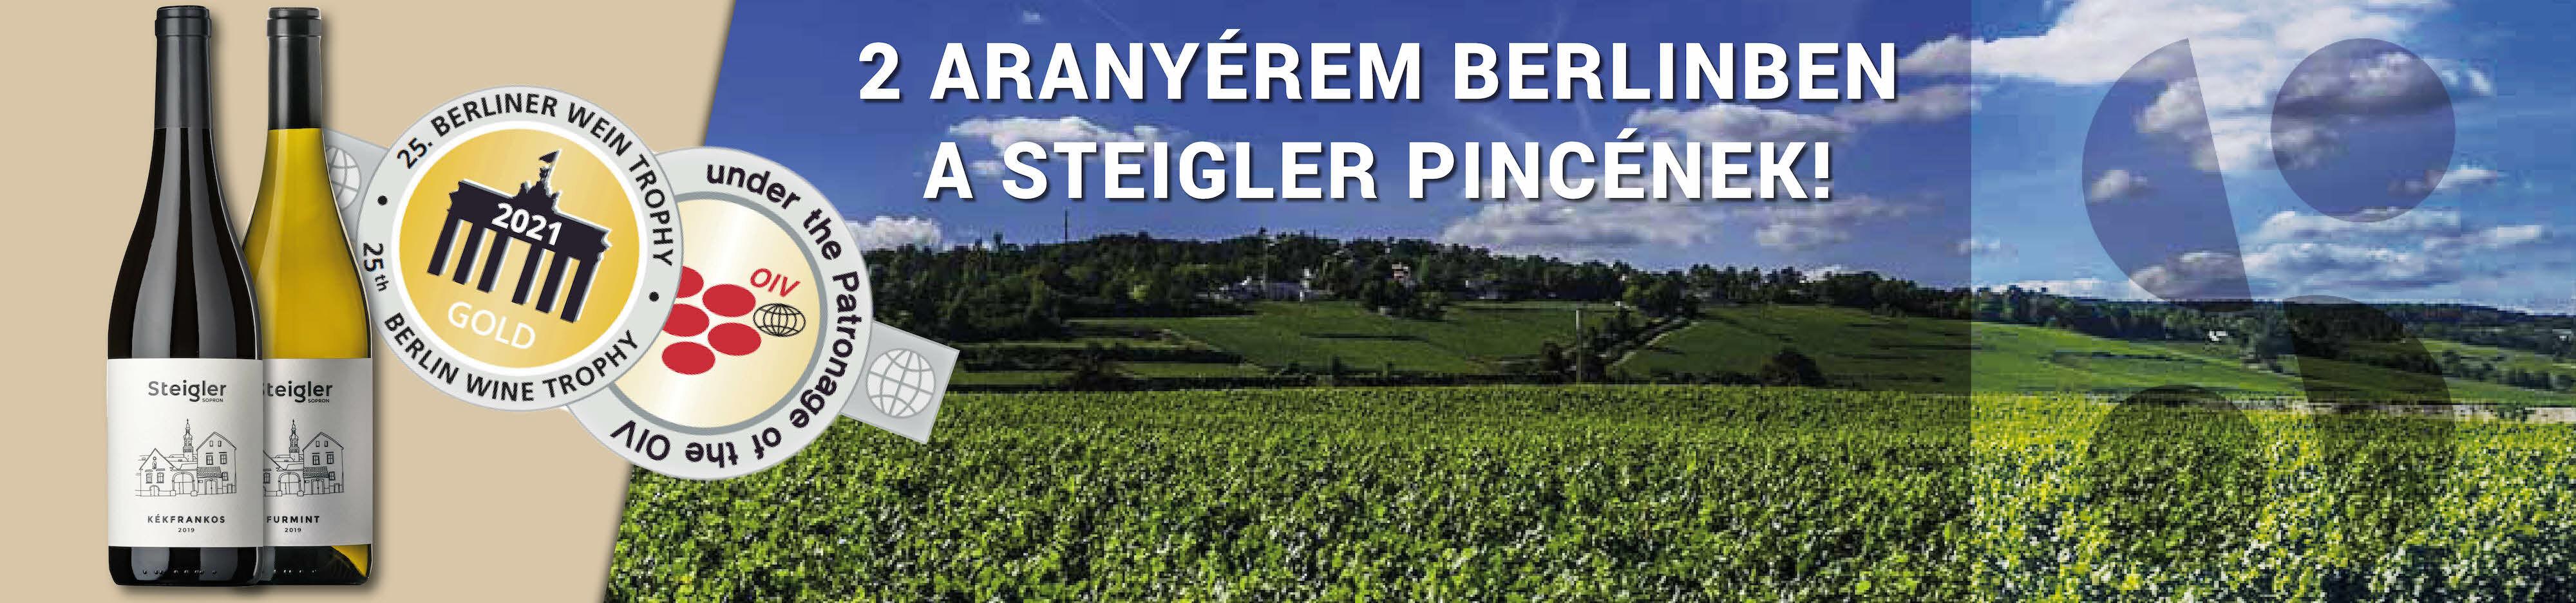 Steigler pince - Kékfrankos bor -Aranyérmes borok